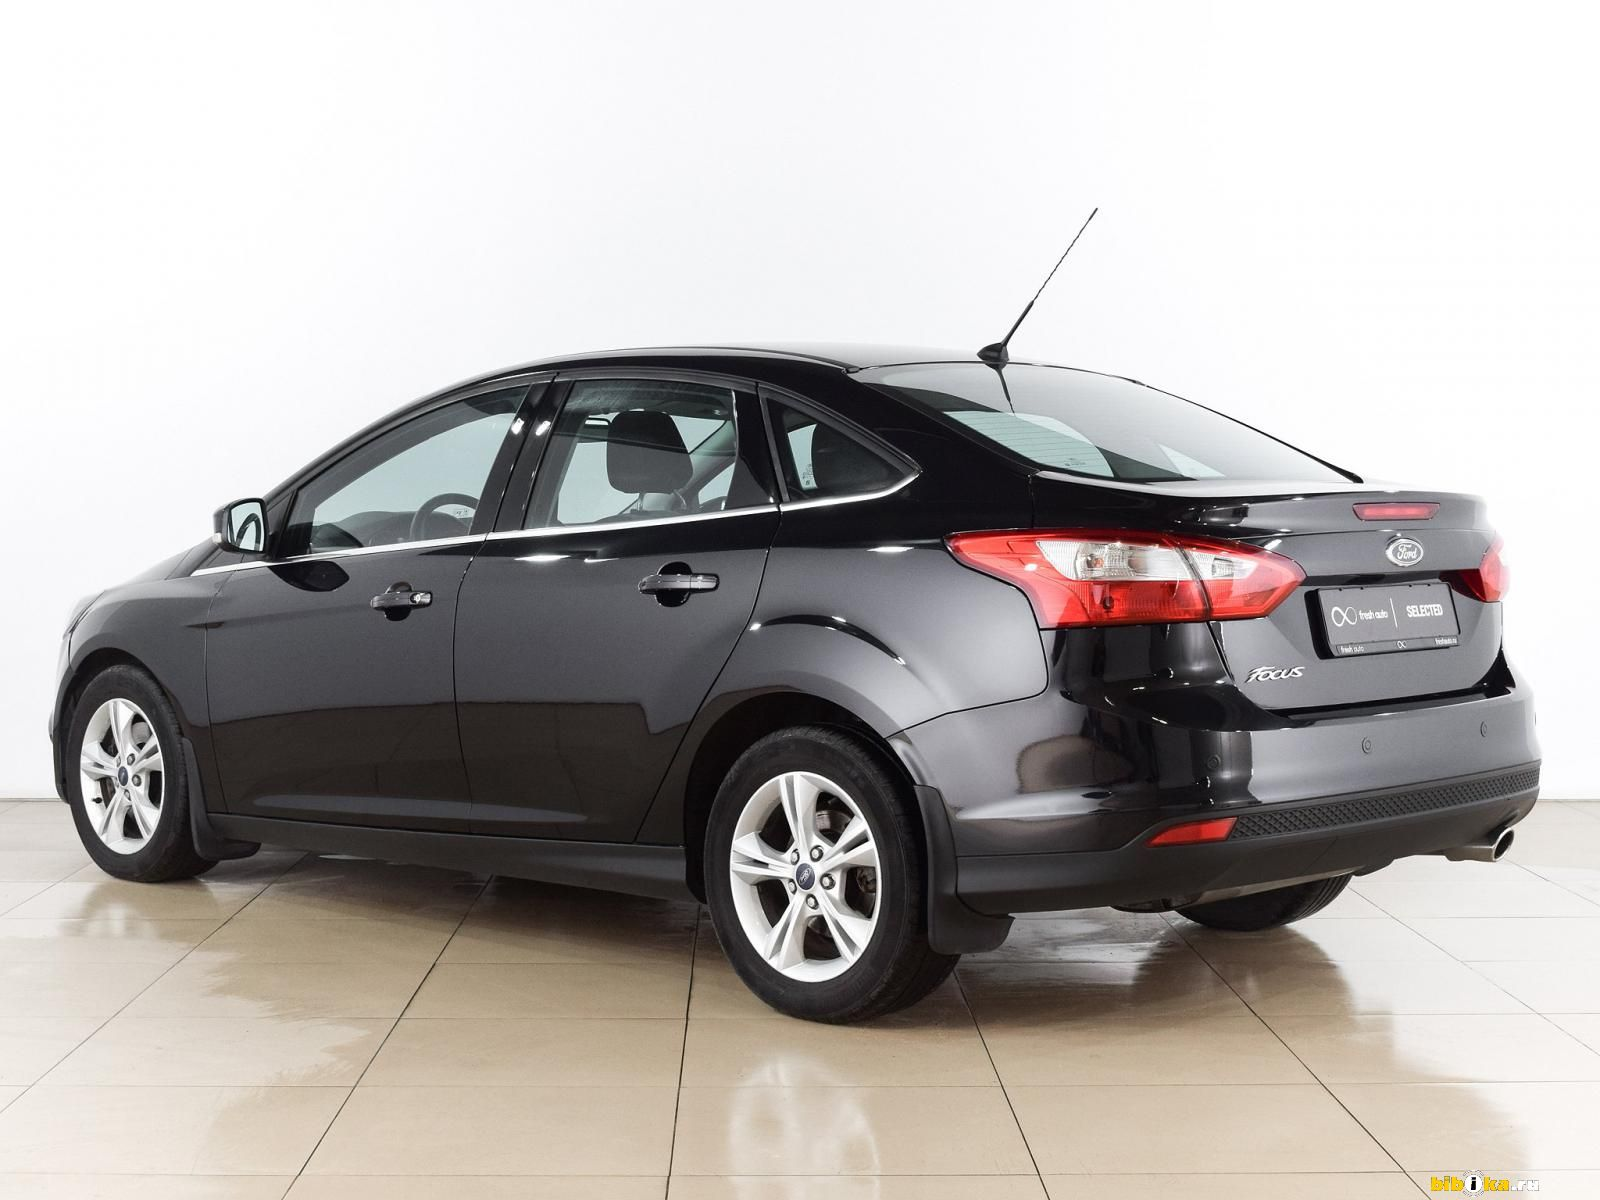 Ford Mondeo 2015, бензин, 2500 куб.см, 150 л.с. - отзыв...